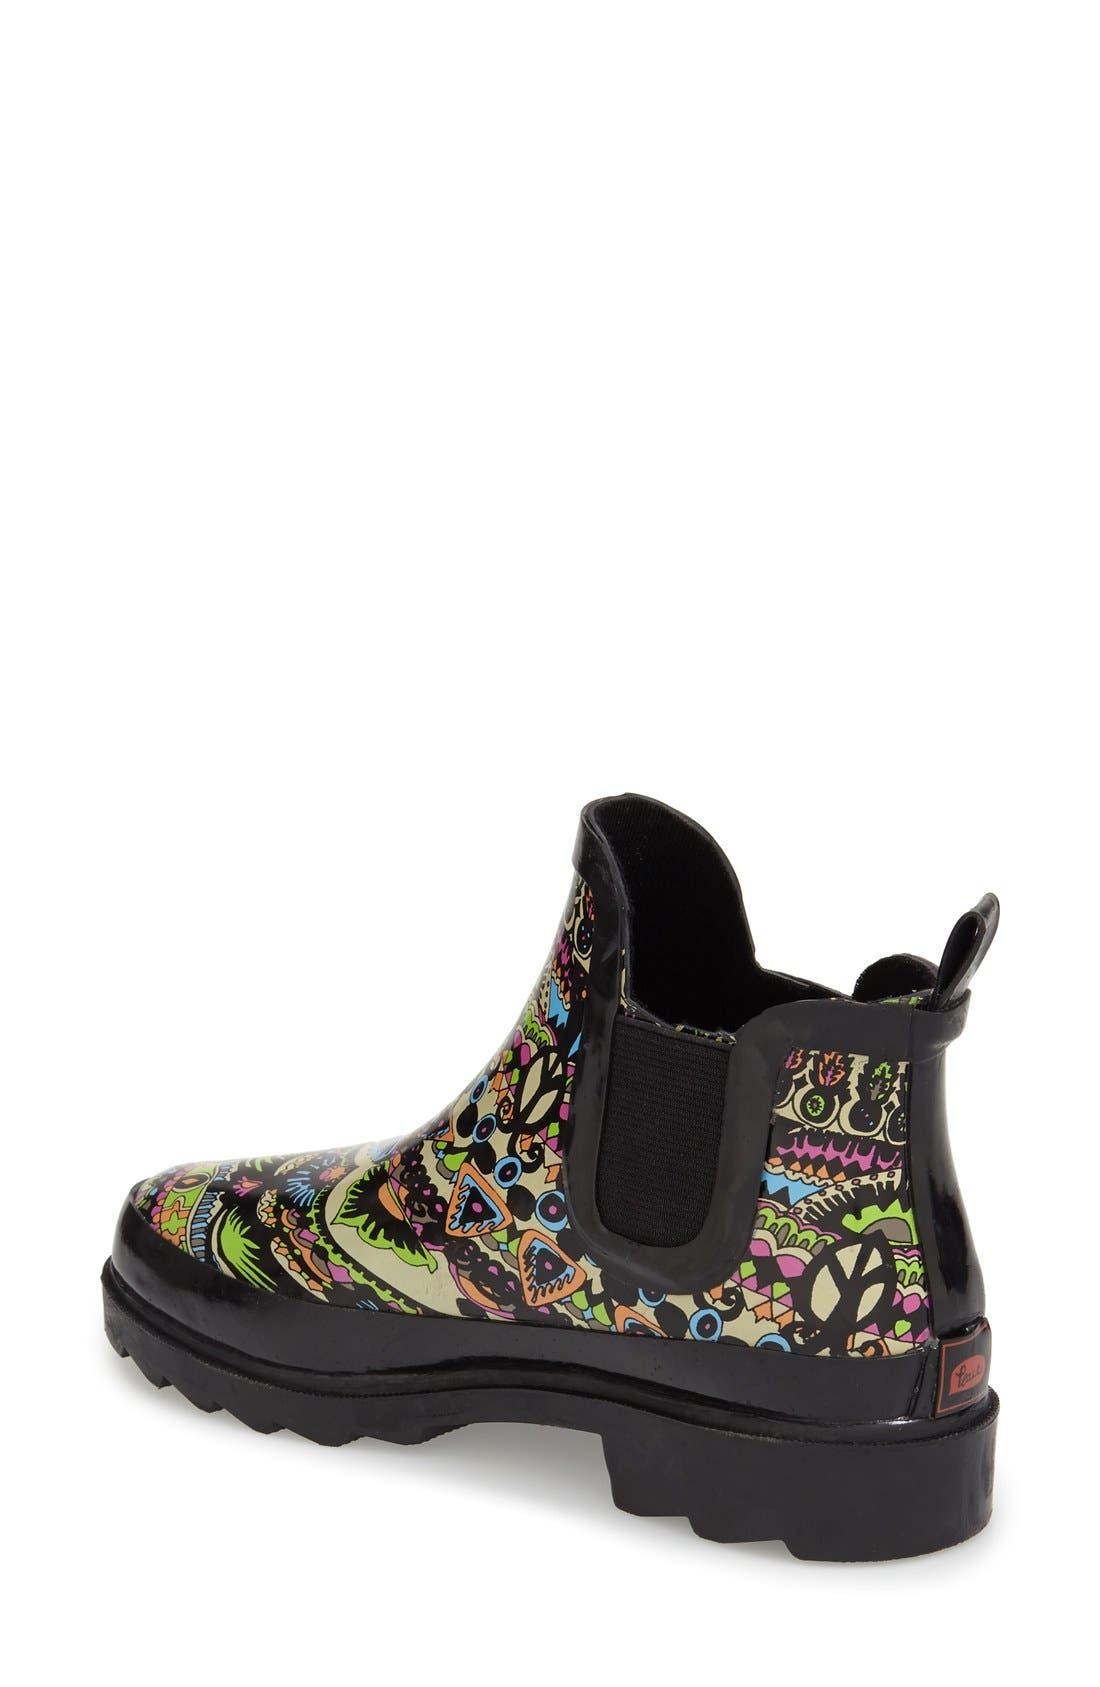 'Rhyme' Waterproof Rain Boot,                             Alternate thumbnail 31, color,